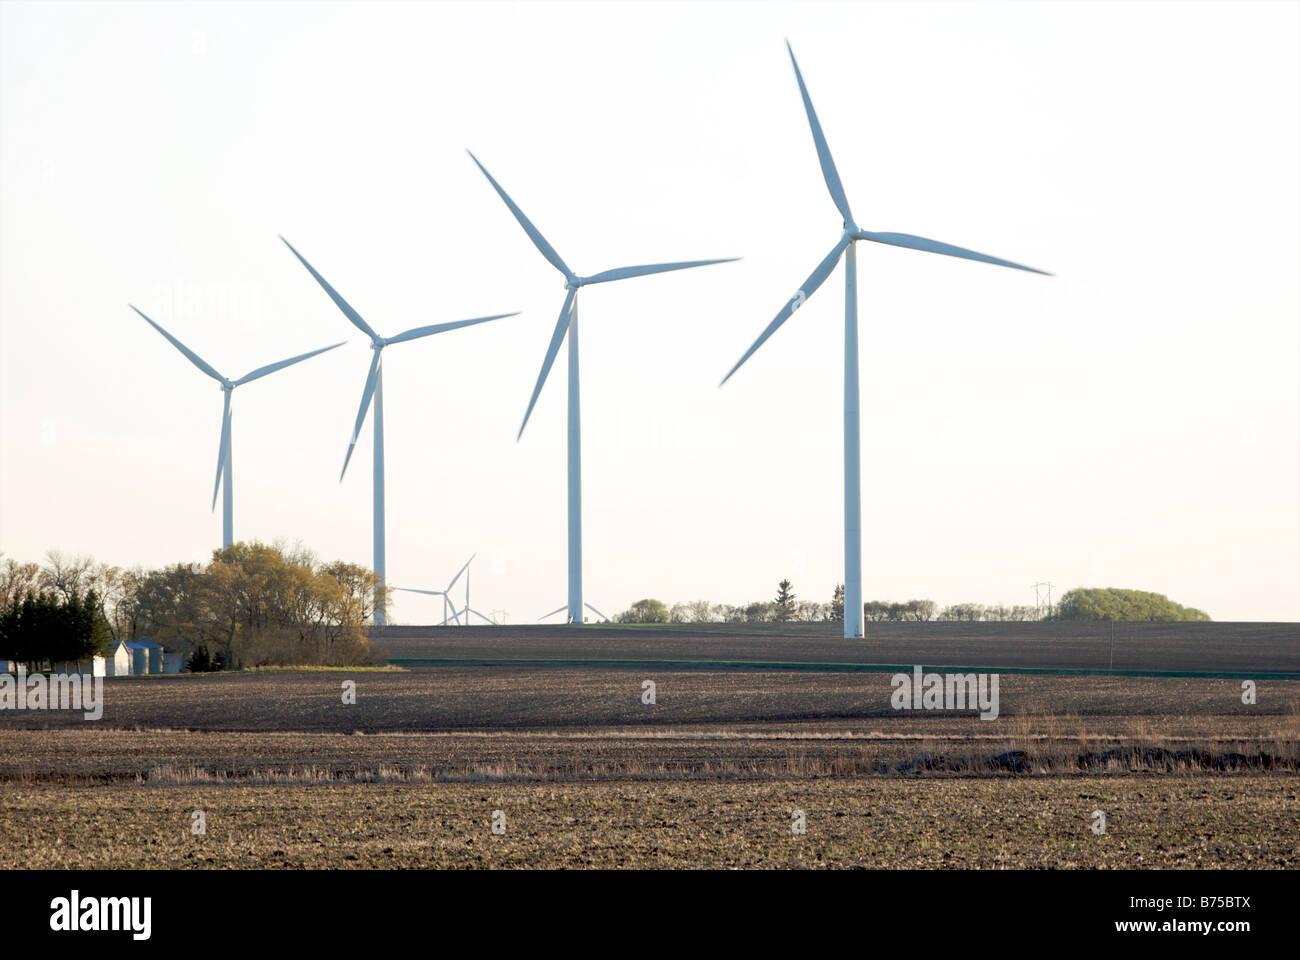 Four wind turbines - Stock Image